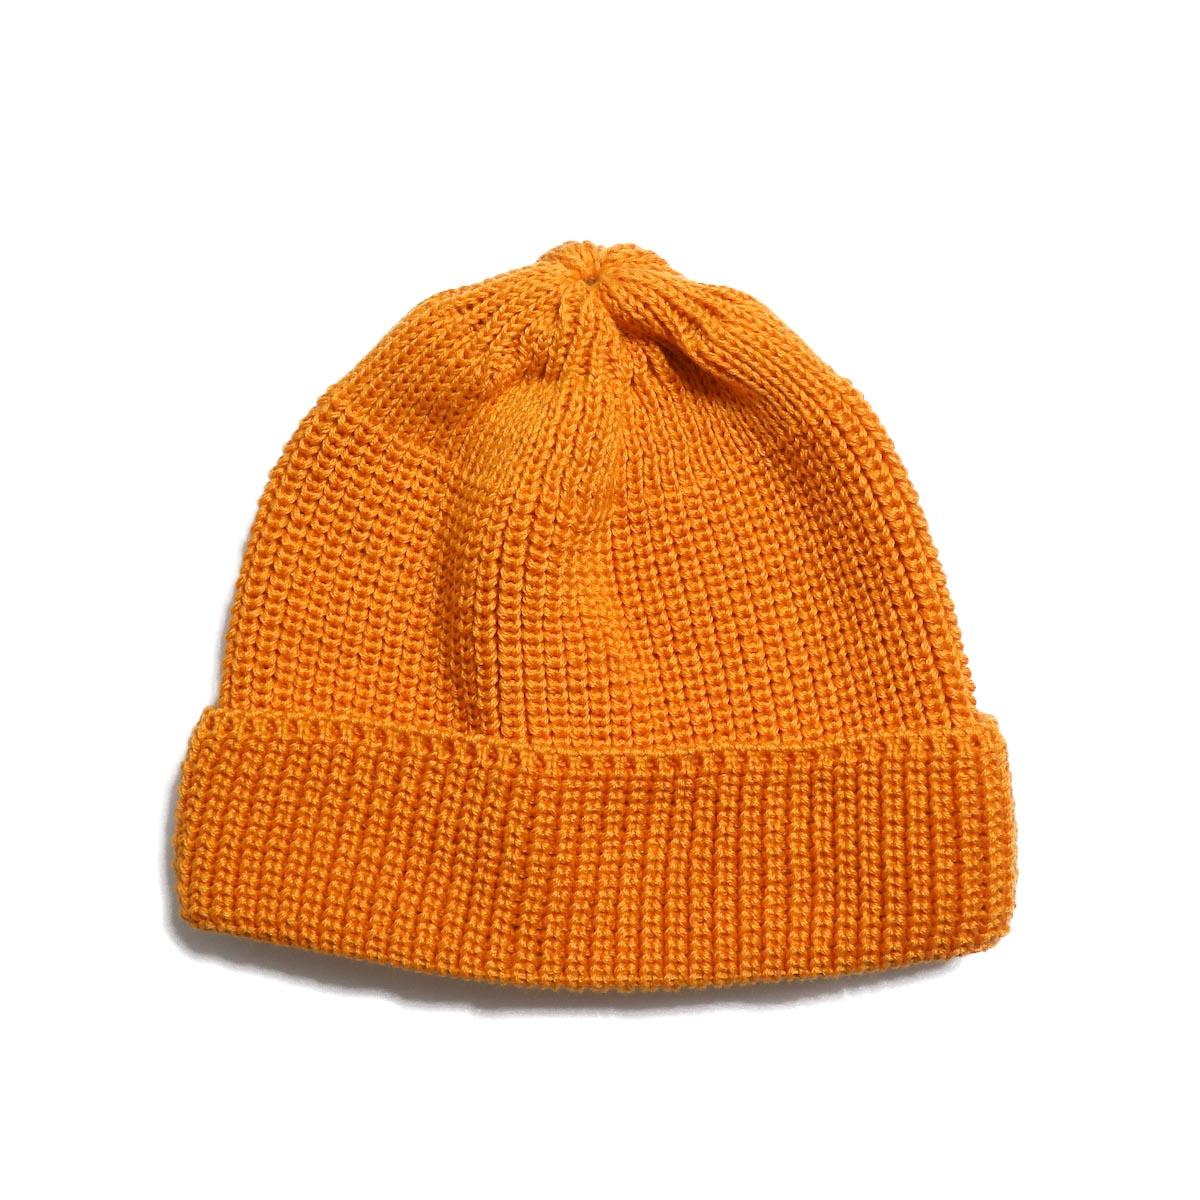 LEUCHTFEUER / WALFANGER -Cotton×Acrylic (Orange)